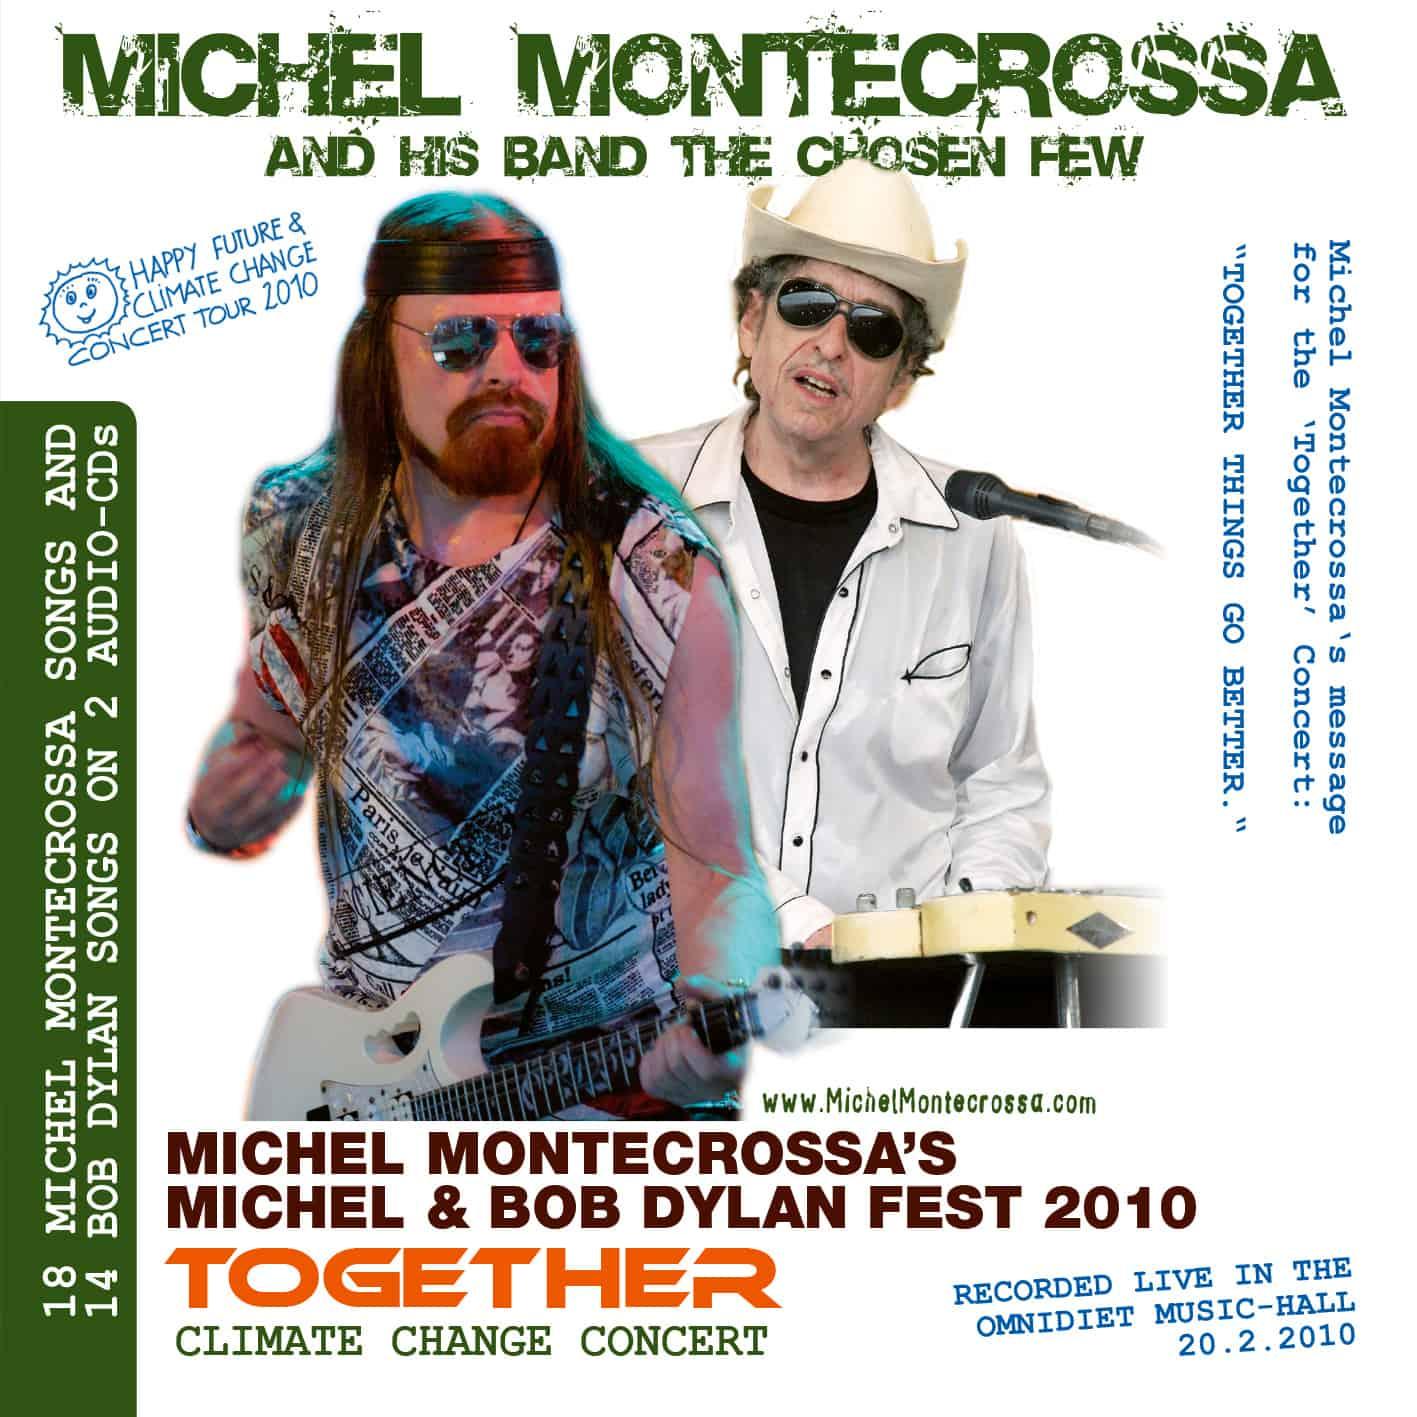 Together - Michel Montecrossa's Michel & Bob Dylan Fest 2010